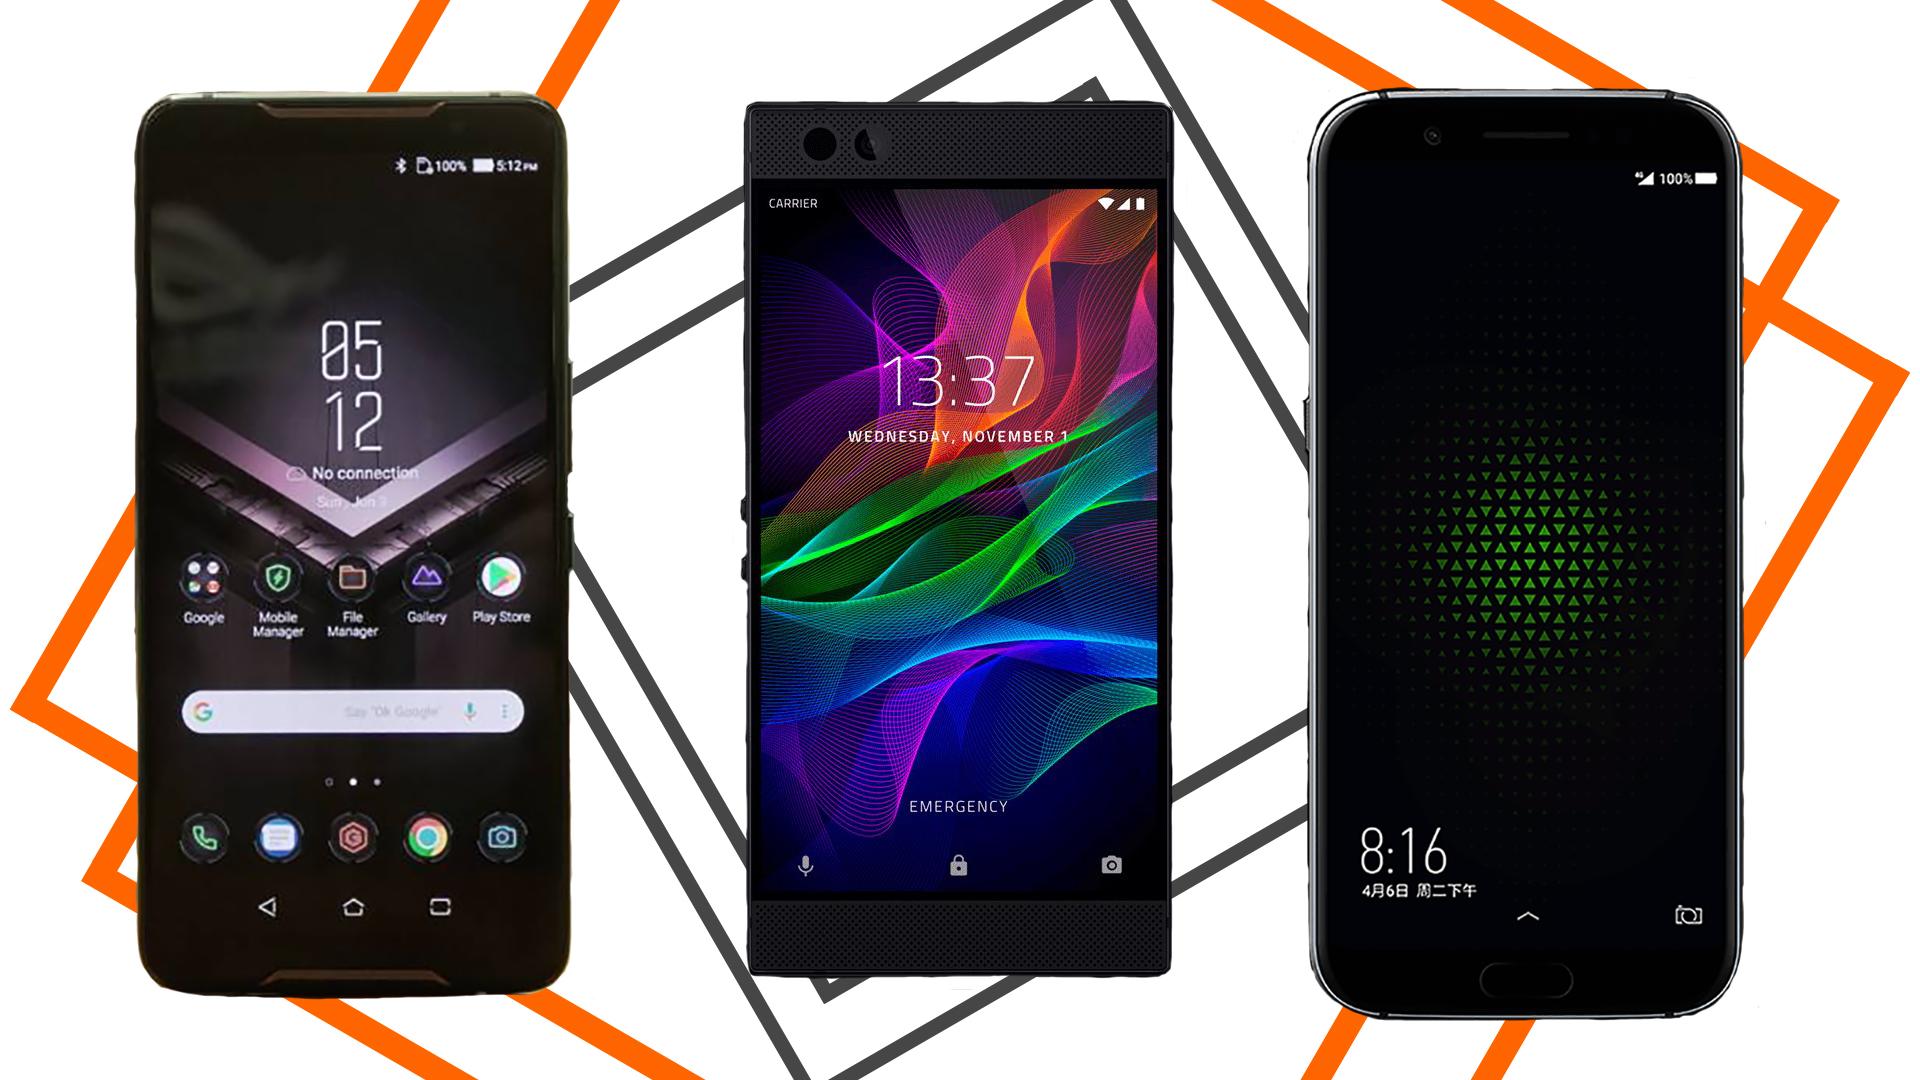 Gaming Phone Showdown - Asus Rog Phone Vs Razer Phone 2 , HD Wallpaper & Backgrounds